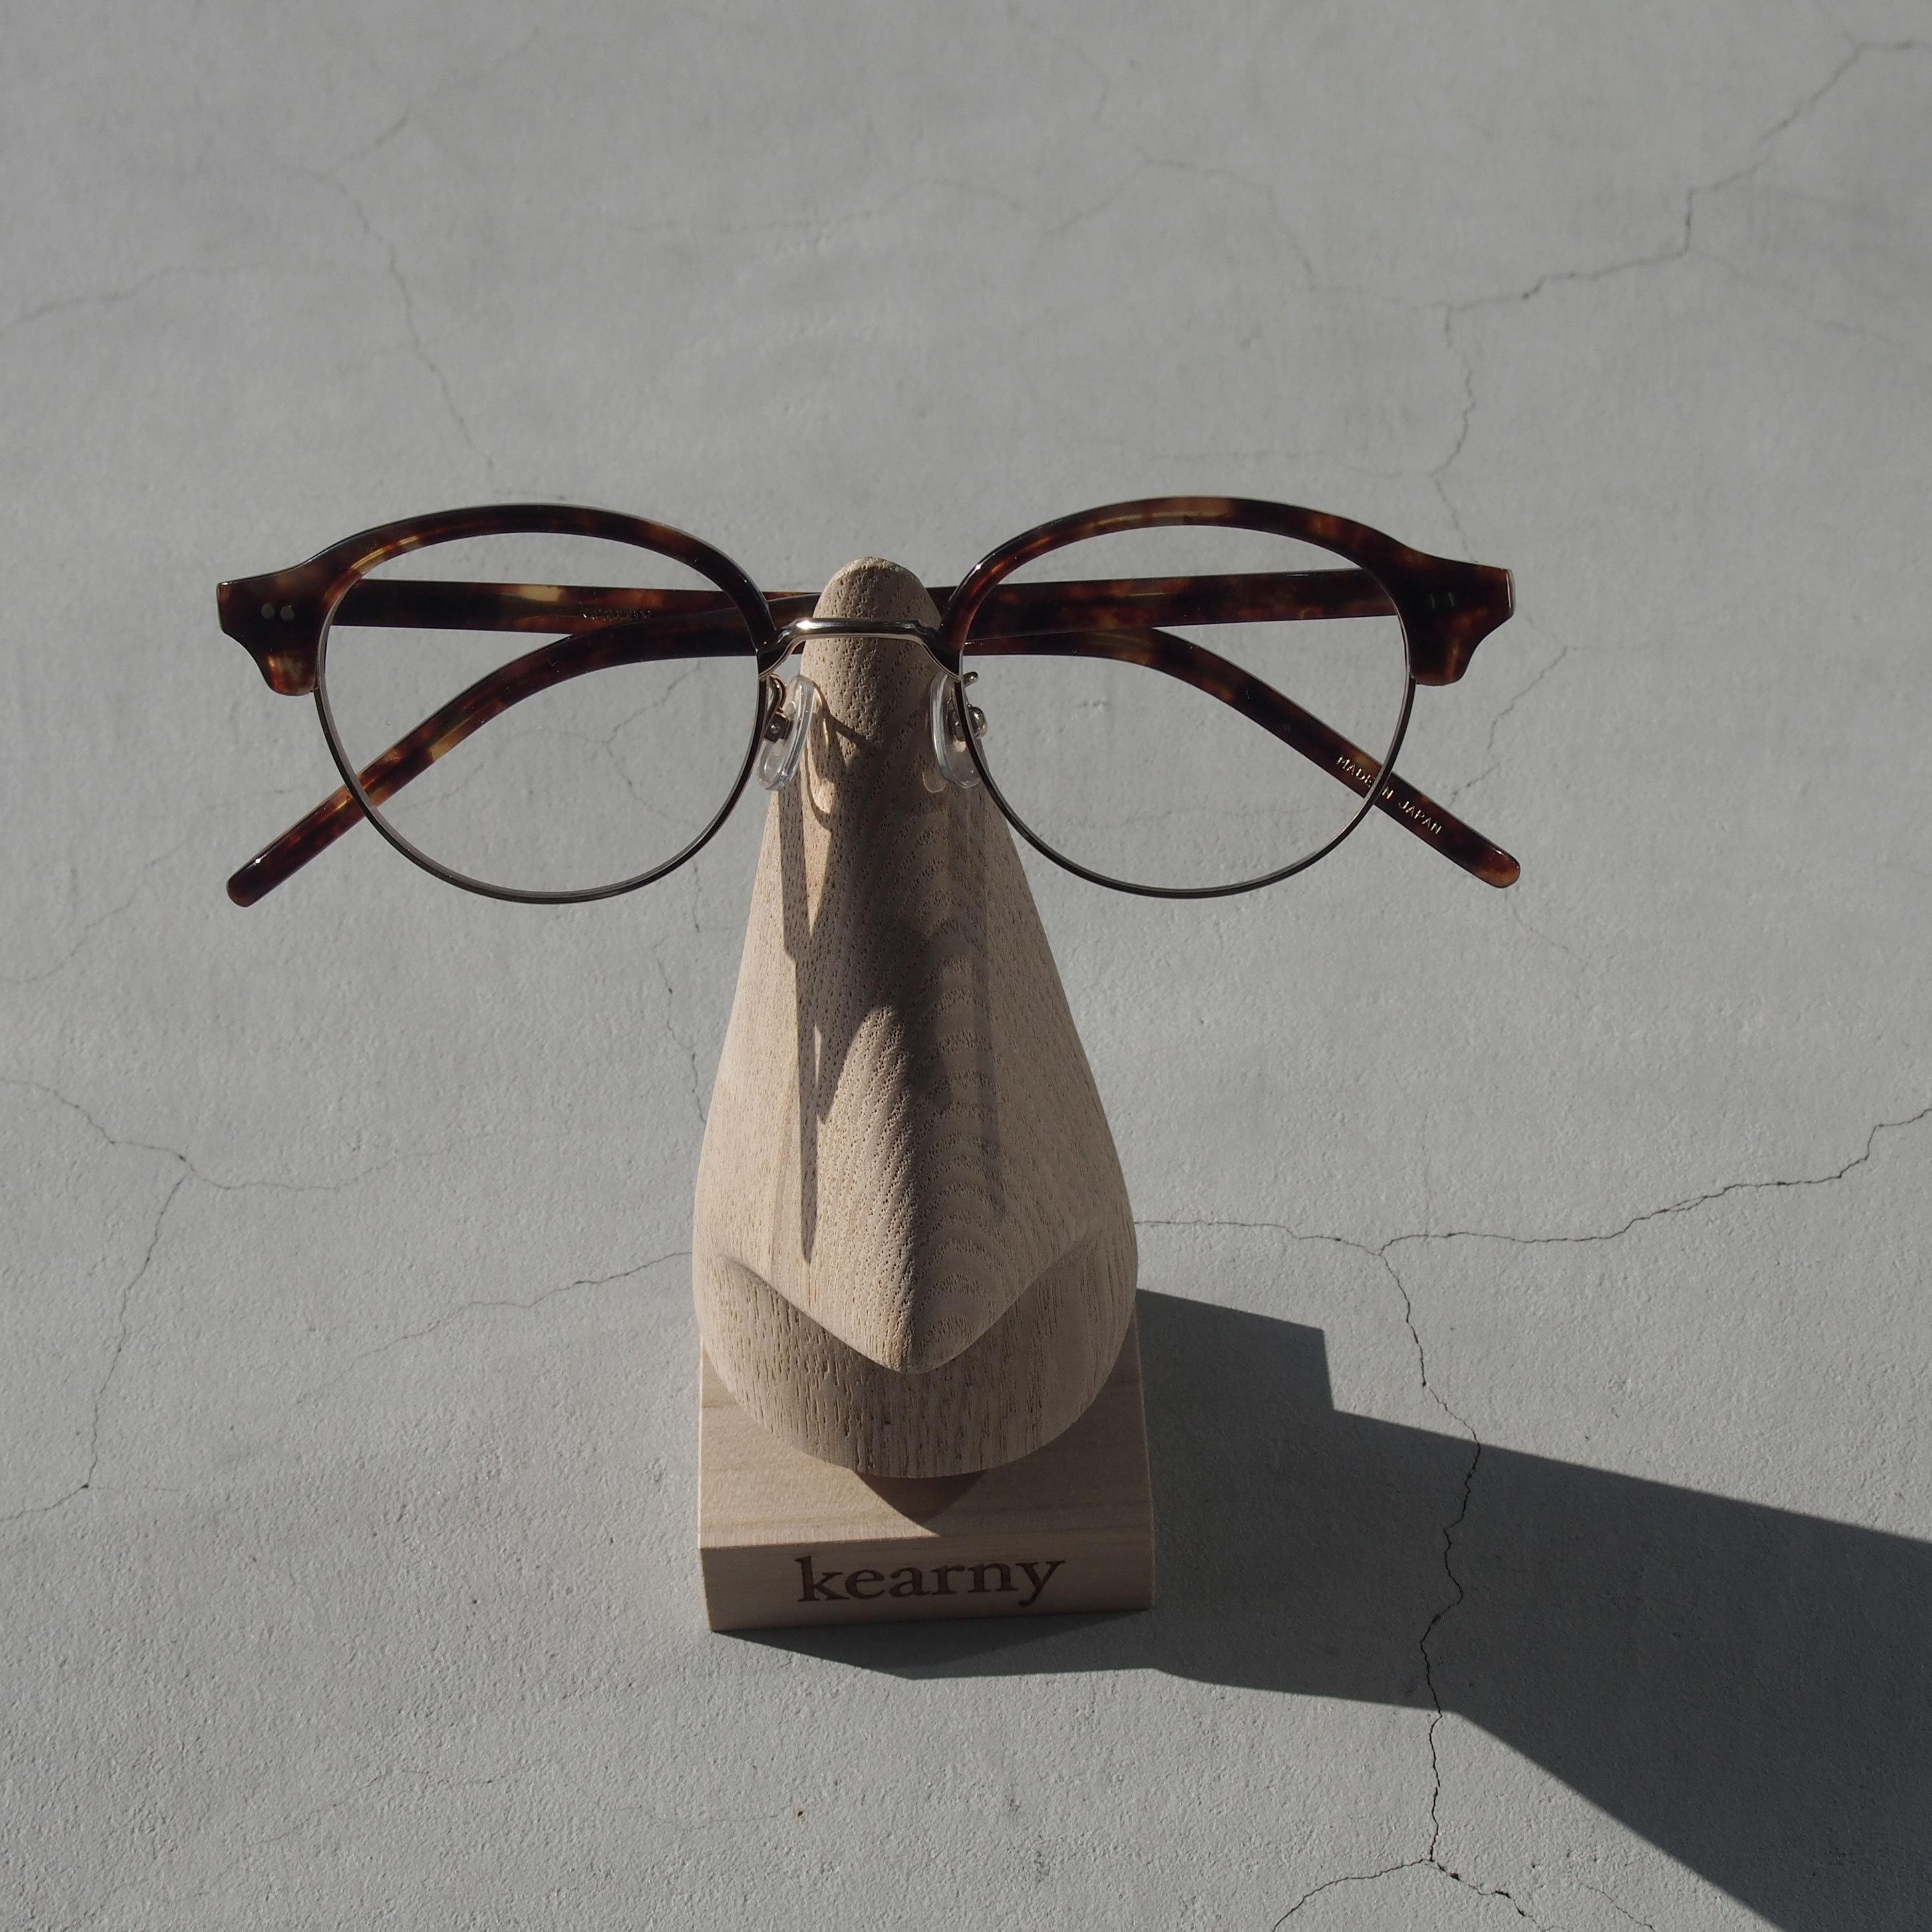 Kearny Sirmont brow 鼈甲 (clear lens)